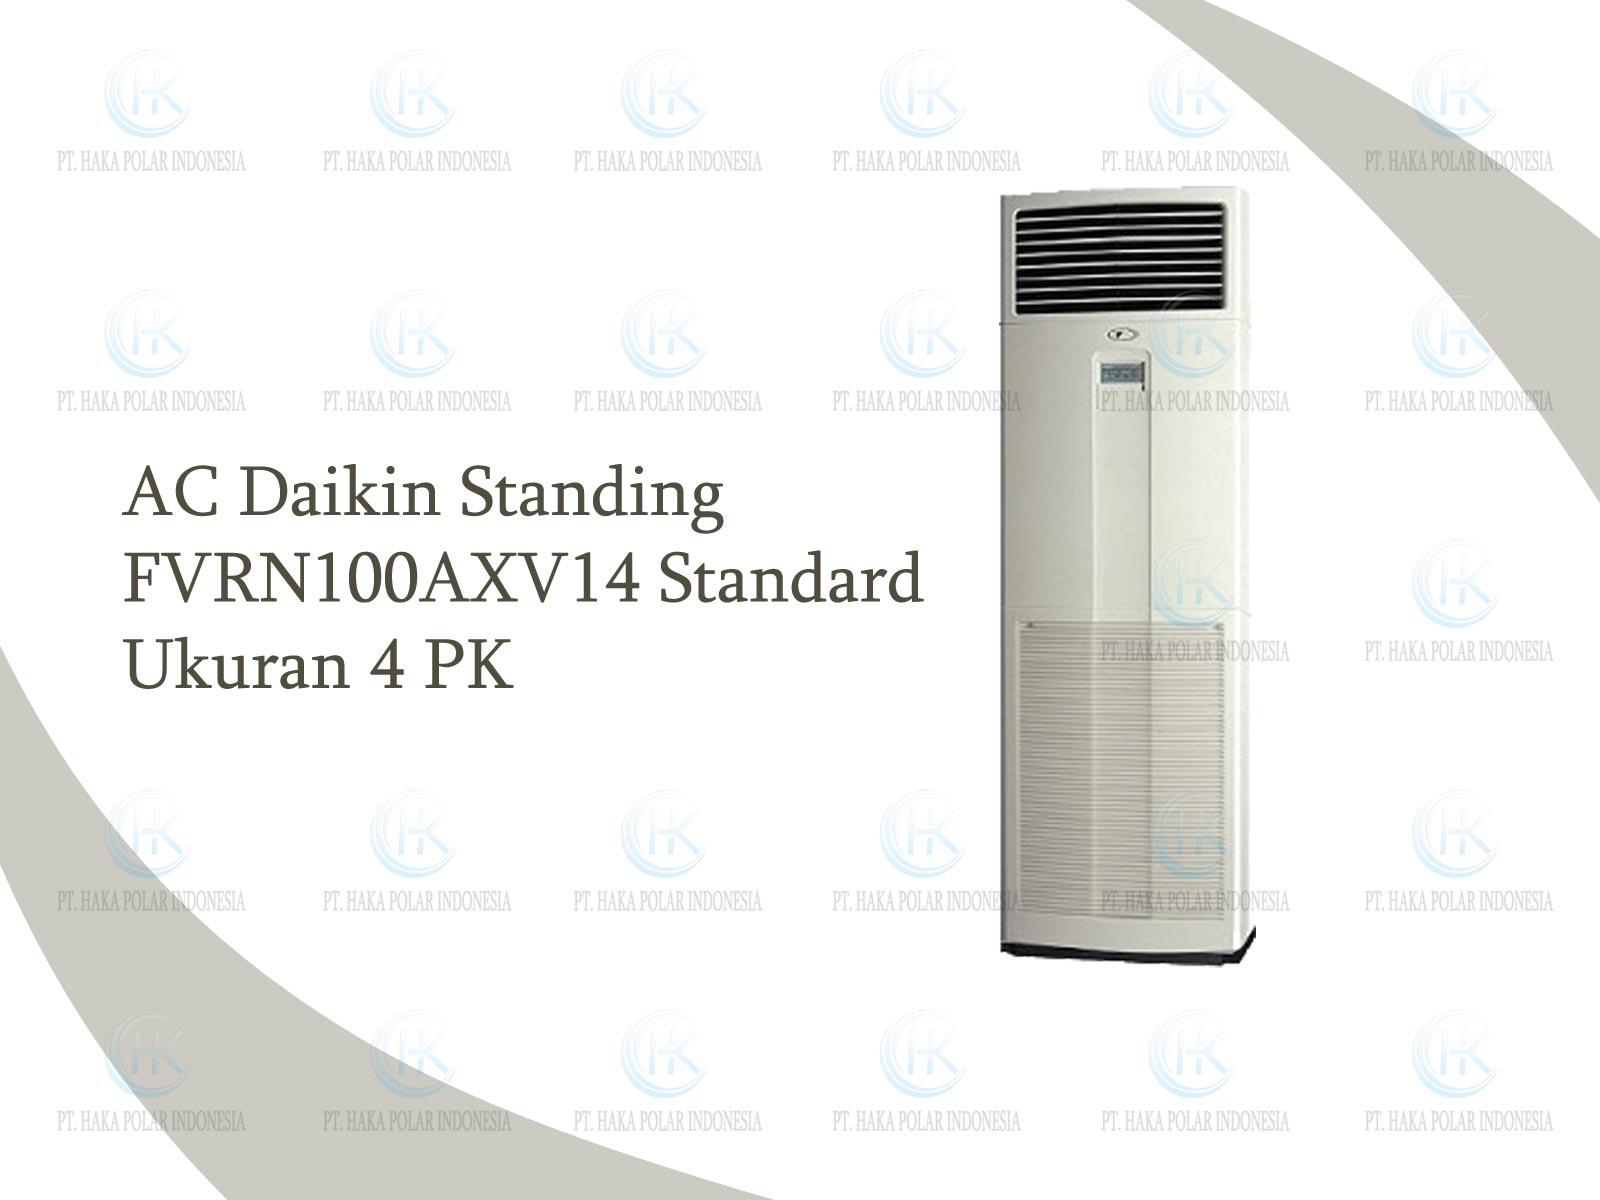 AC Daikin Mini Skyair FVRN100AXV14 4 PK Floor Standing Standard R410a